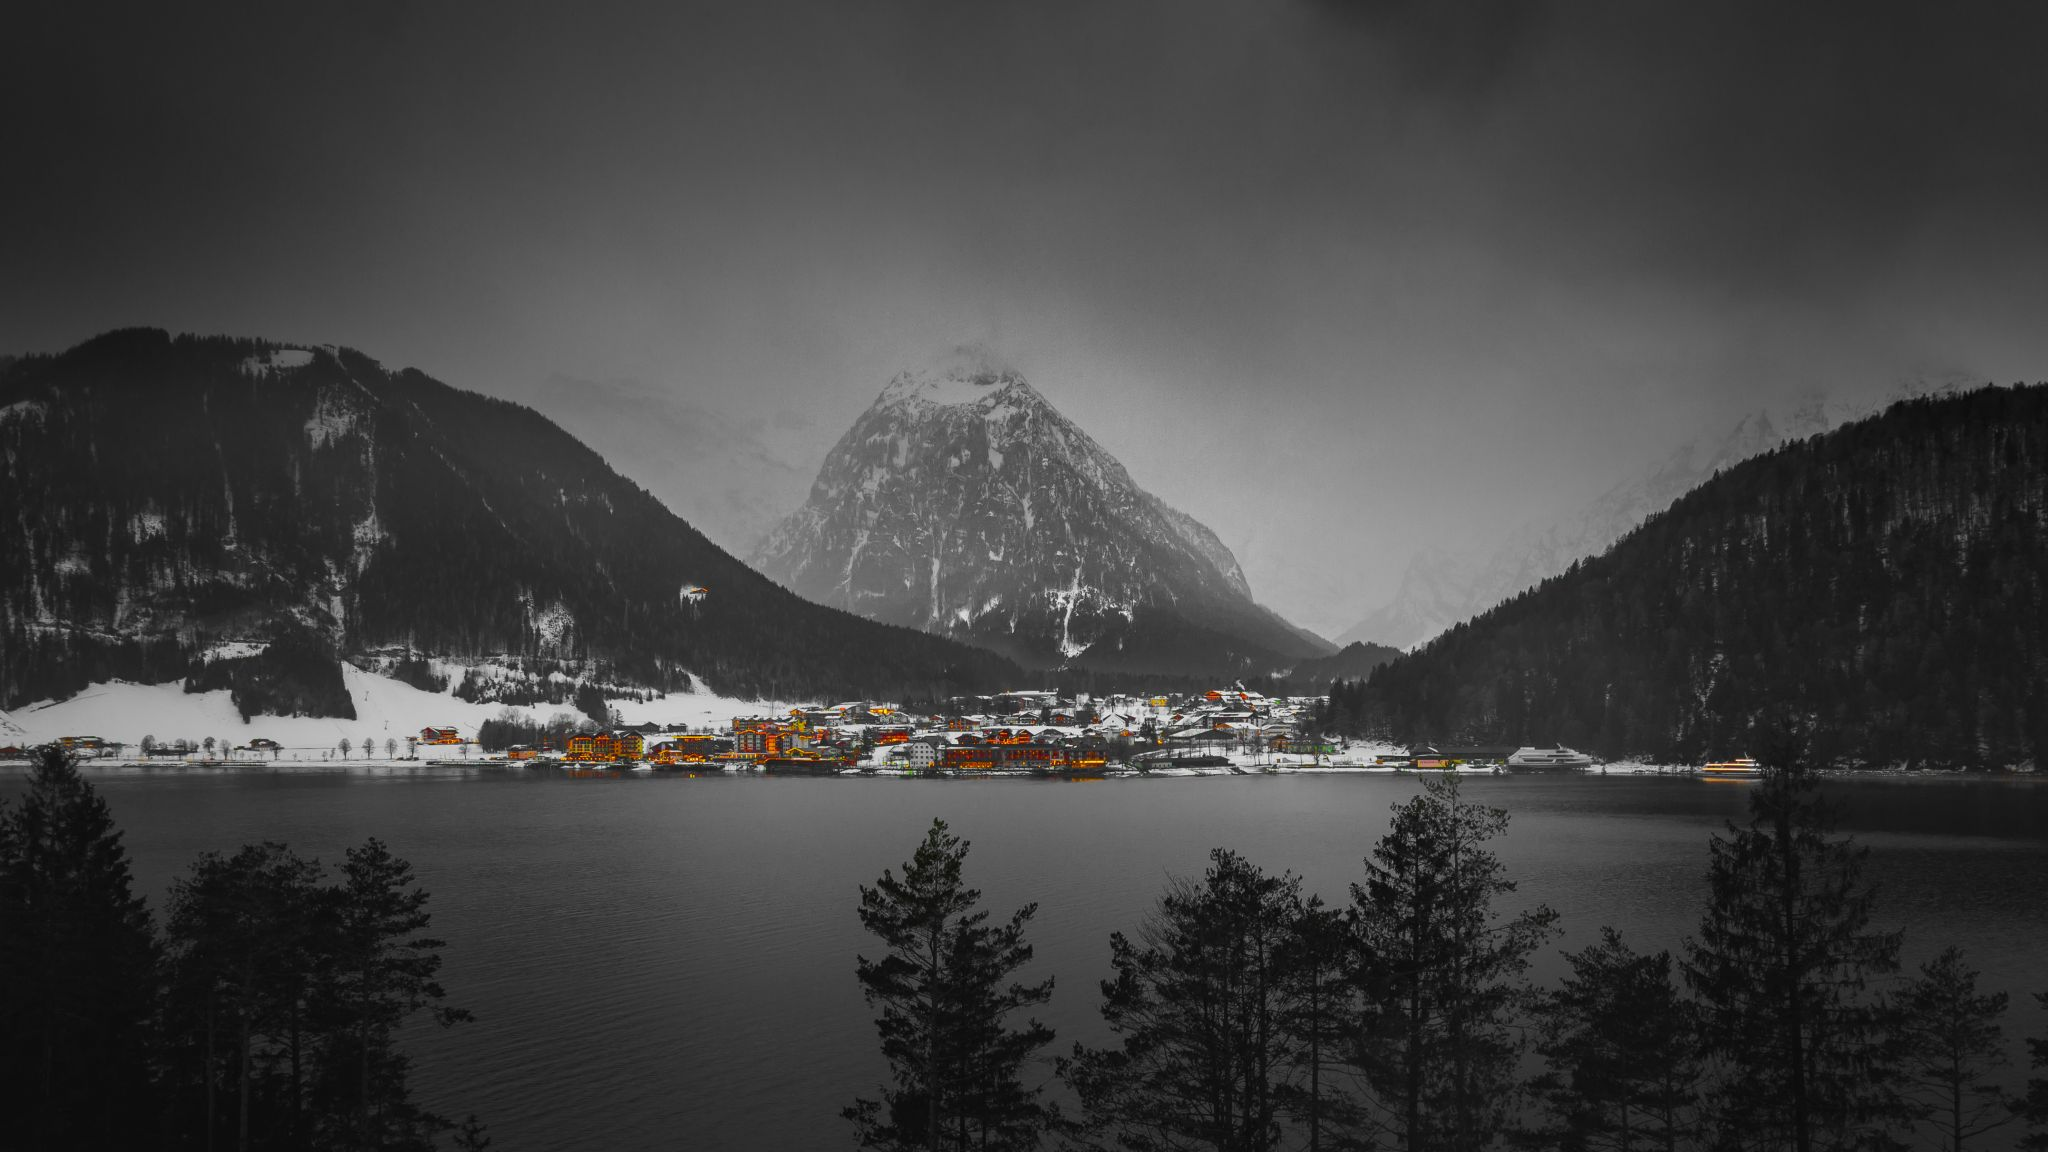 View across the Lake, Austria